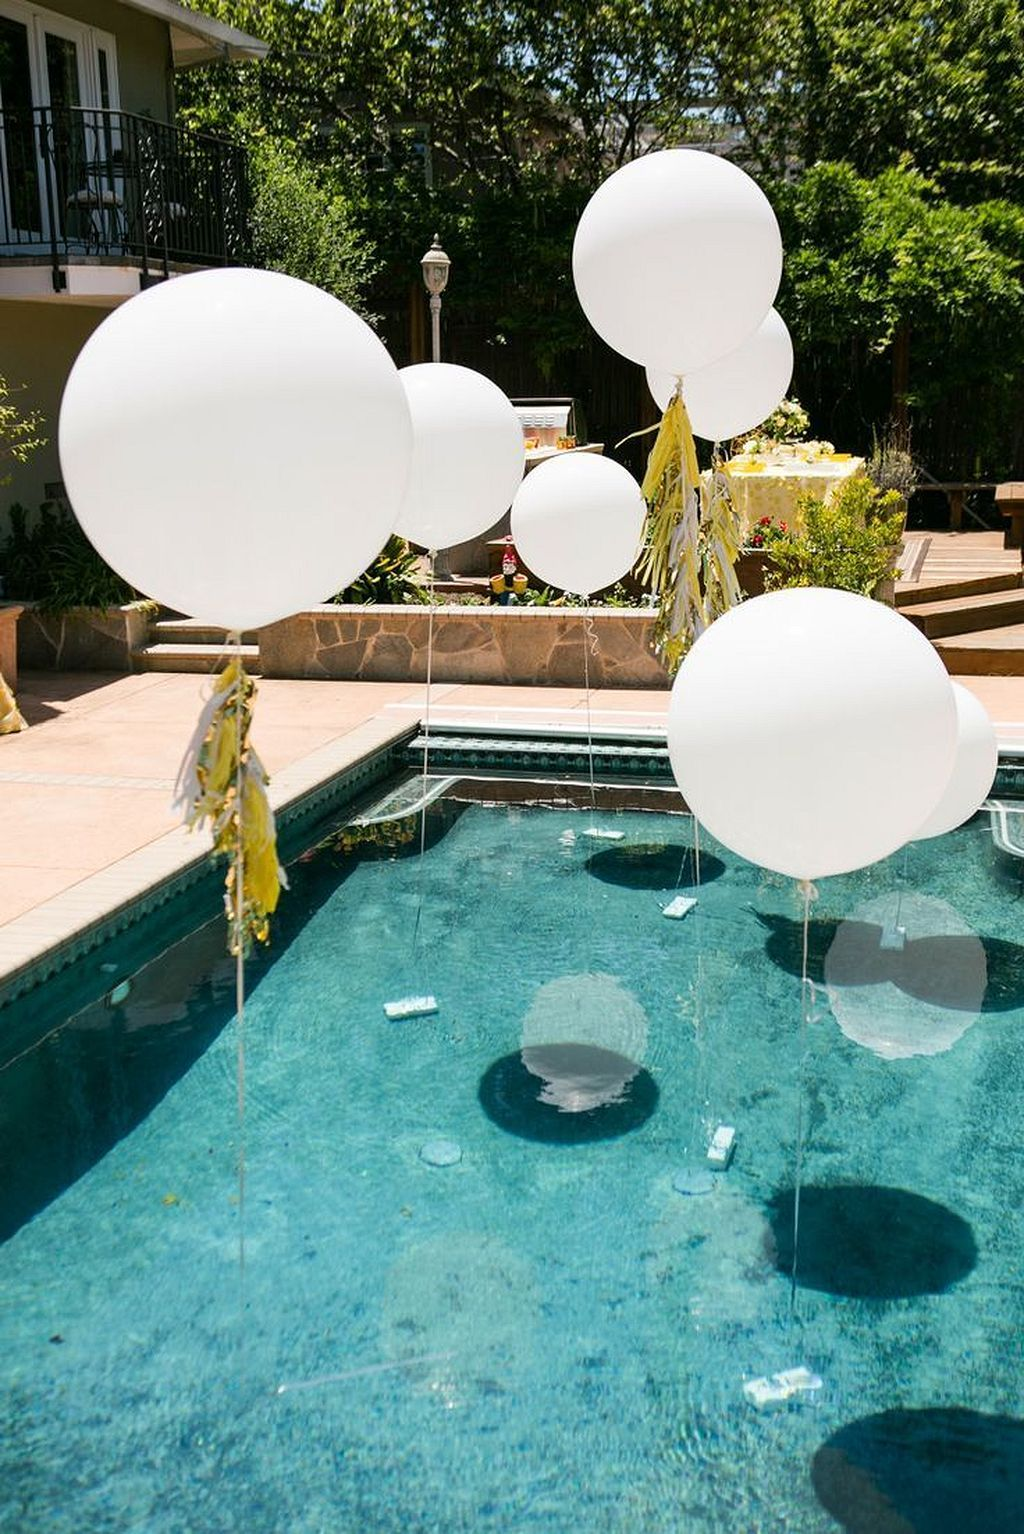 40+ Summer Engagement Party at Backyard | Backyard, Engagement and ...